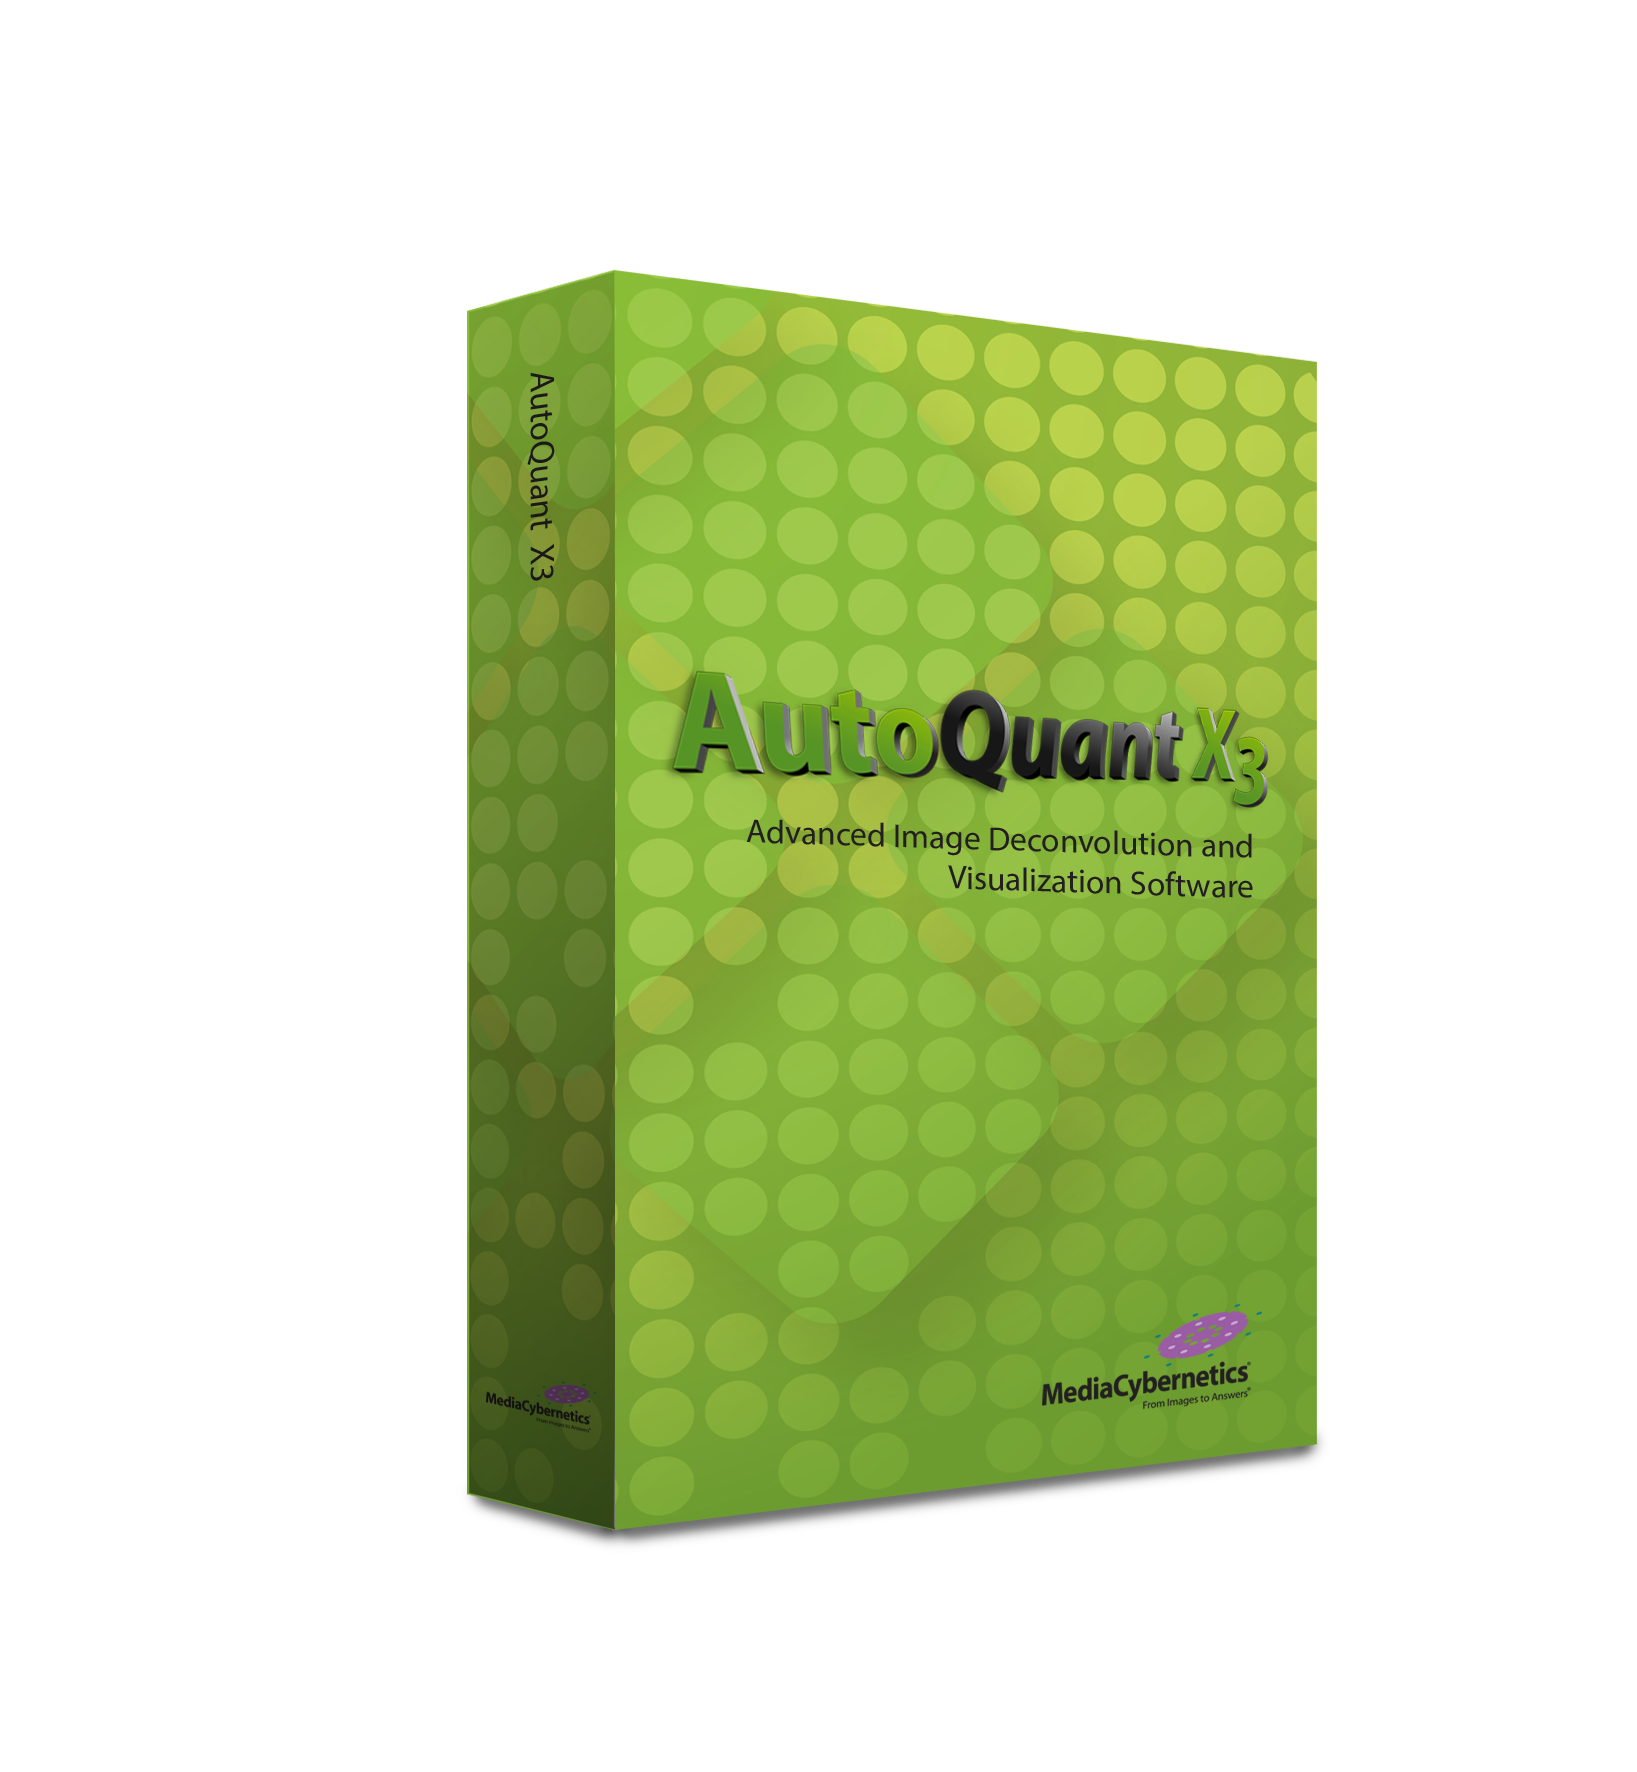 AutoQuant_HI-RES-BOX3